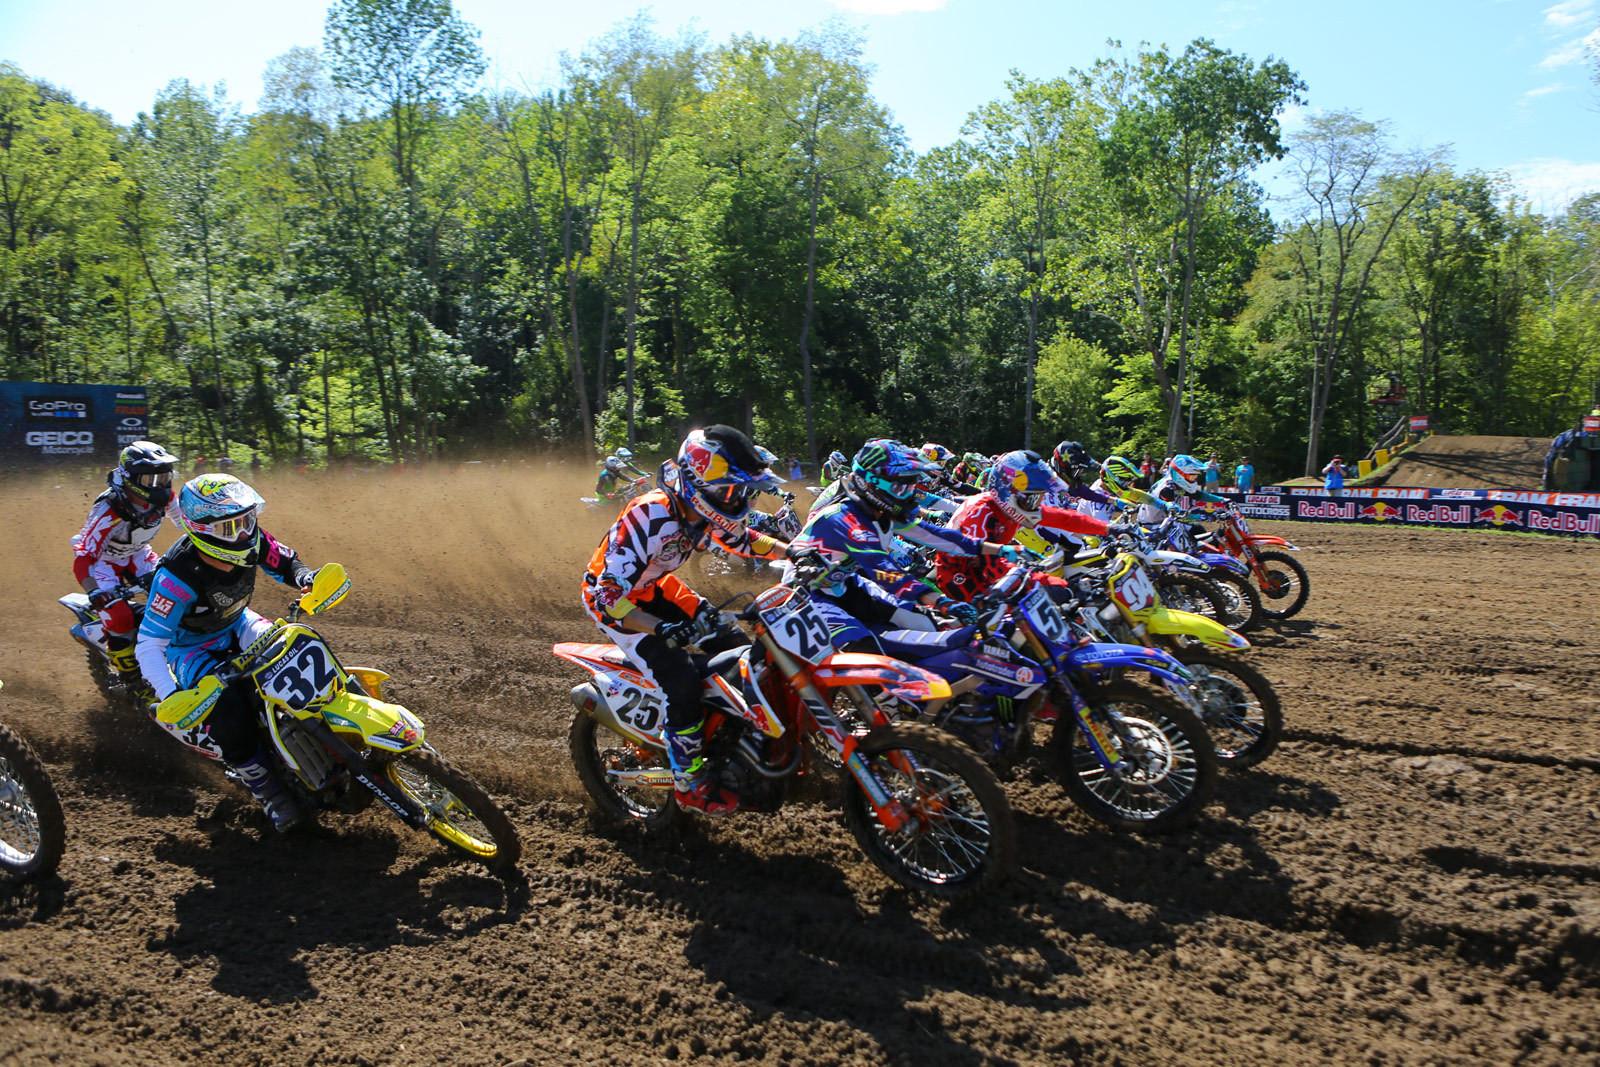 450 moto two start - Photo Blast: Ironman - Motocross Pictures - Vital MX